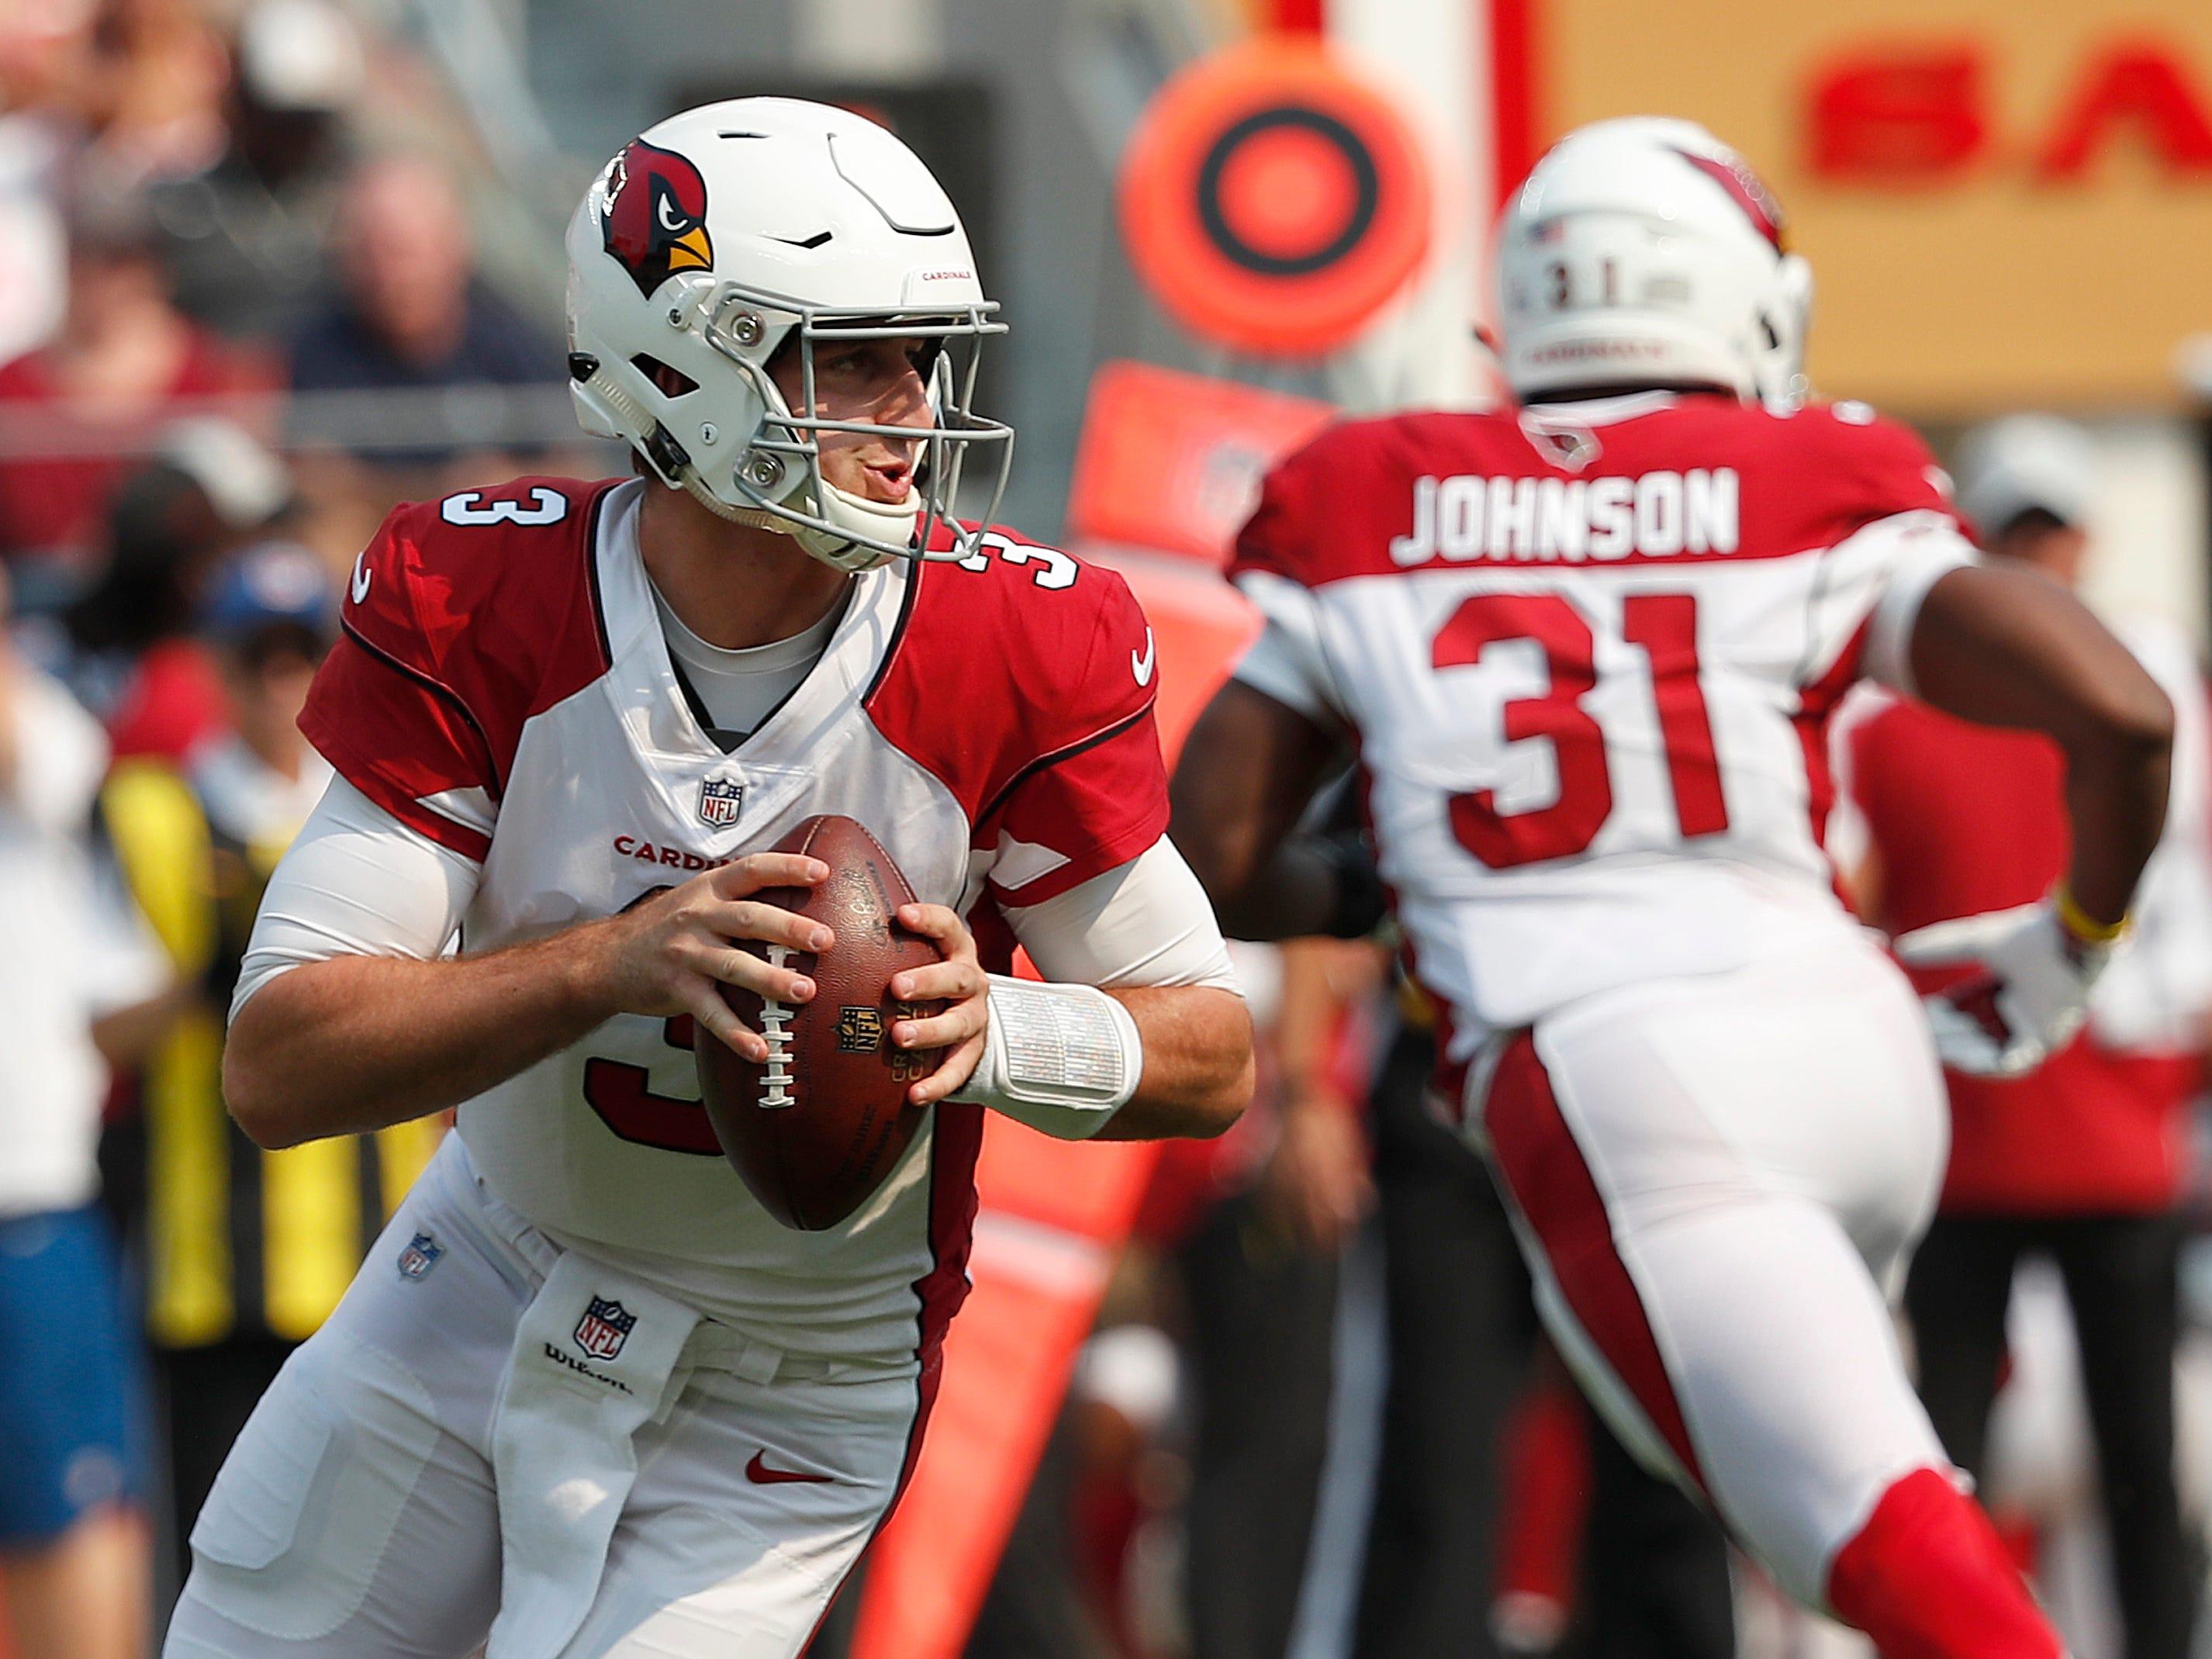 Arizona Cardinals quarterback Josh Rosen (3) passes against the San Francisco 49ers during the first half of an NFL football game in Santa Clara, Calif., Sunday, Oct. 7, 2018.